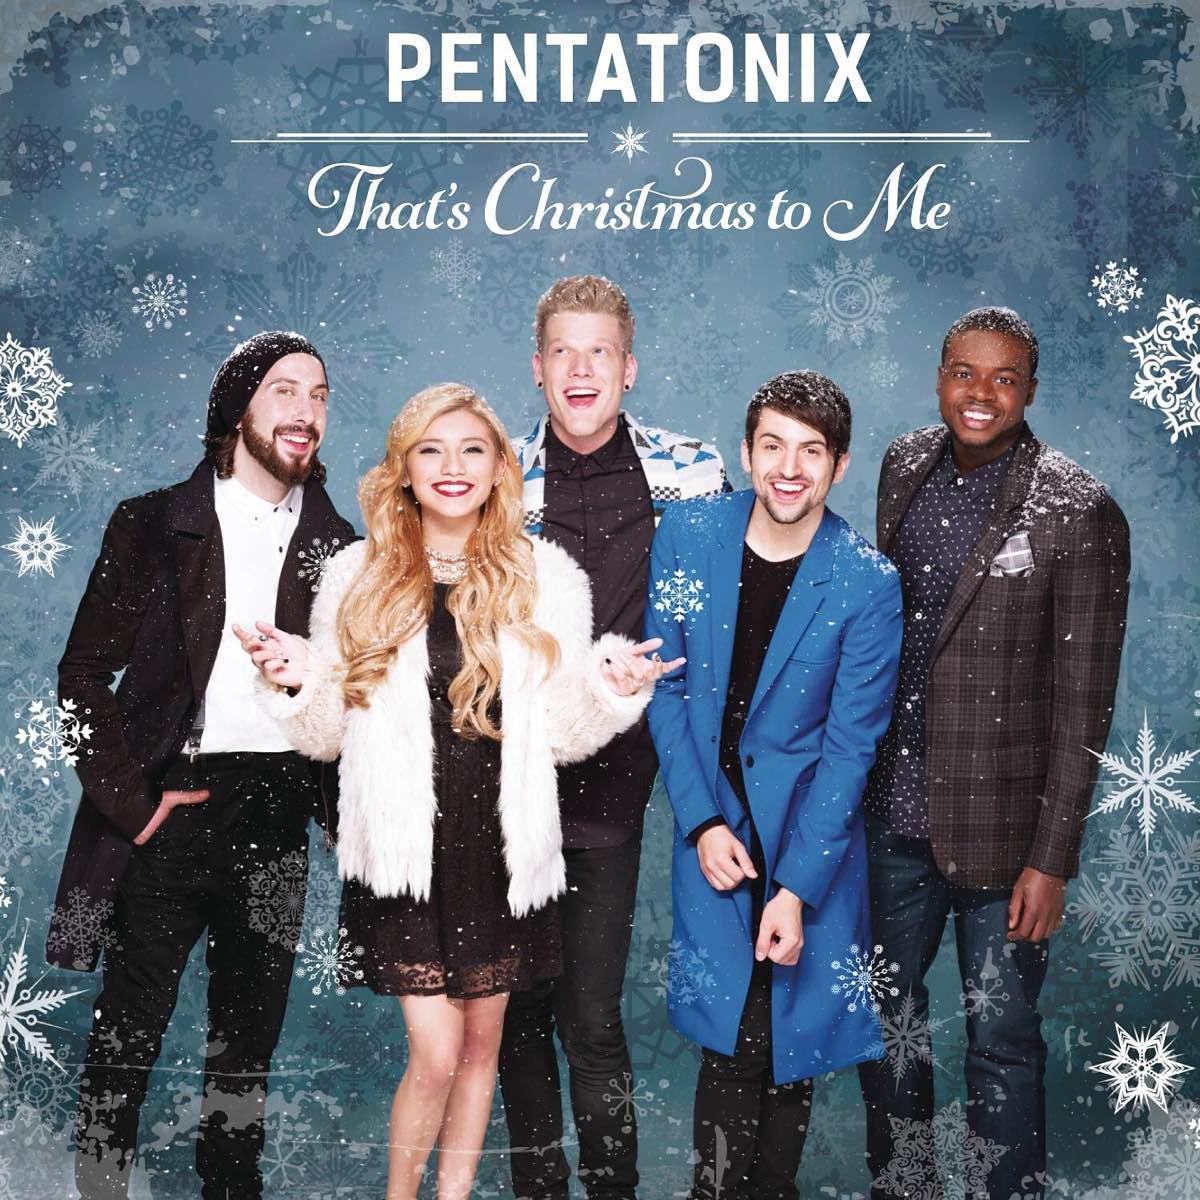 pentatonix-thats-christmas-to-me